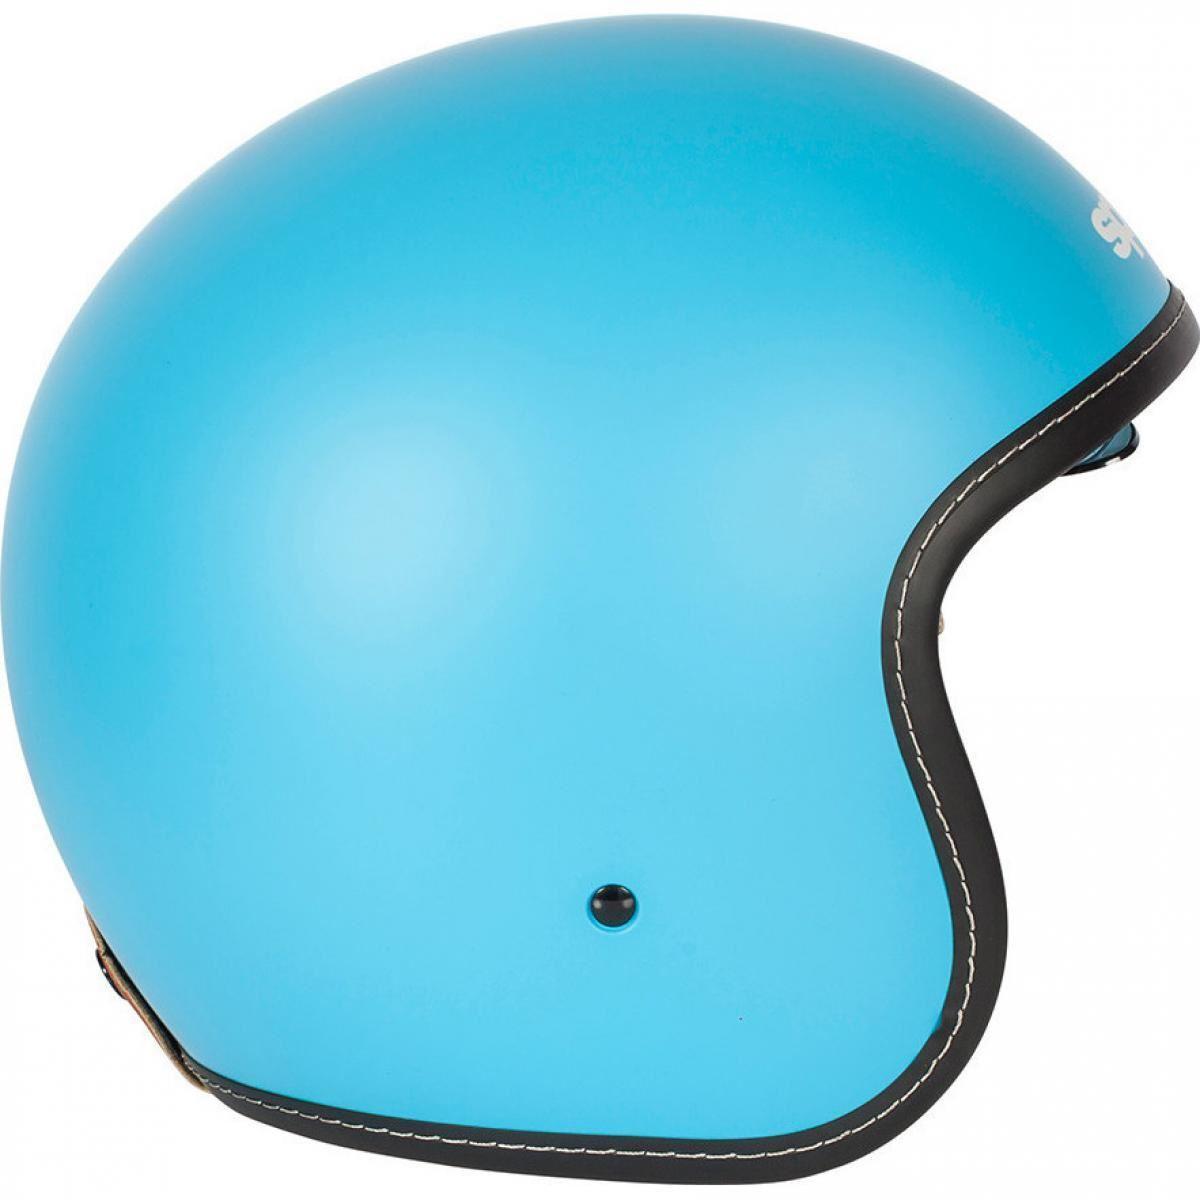 Spada-Raze-Ouvert-Casque-Bleu-Integre-Visiere miniature 11